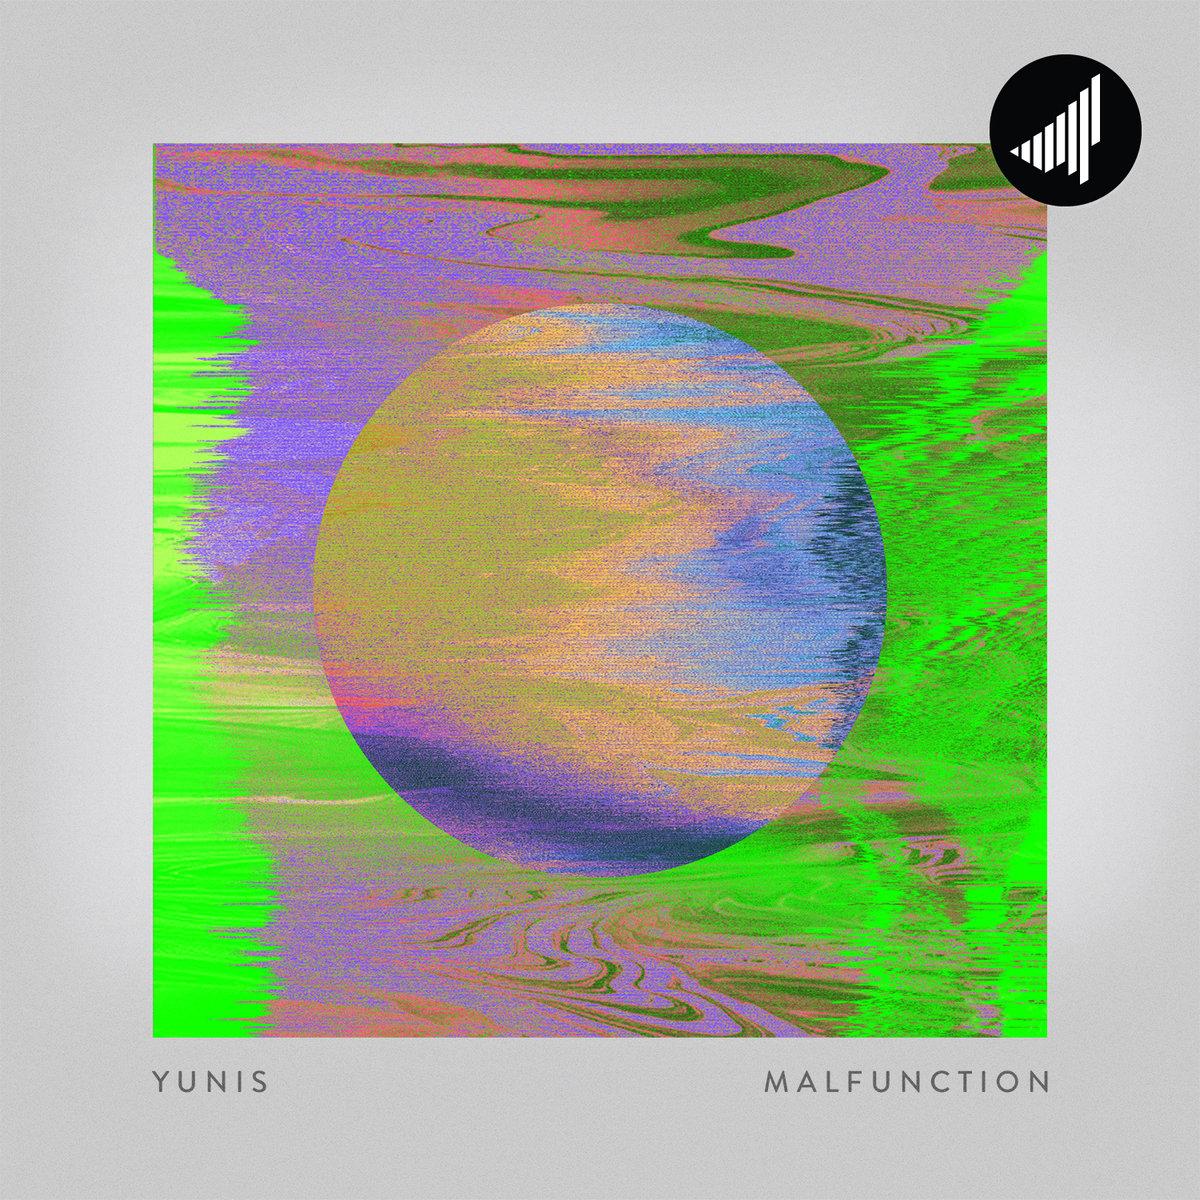 yunis-malfunction-fixed-mastering-engineer.jpg